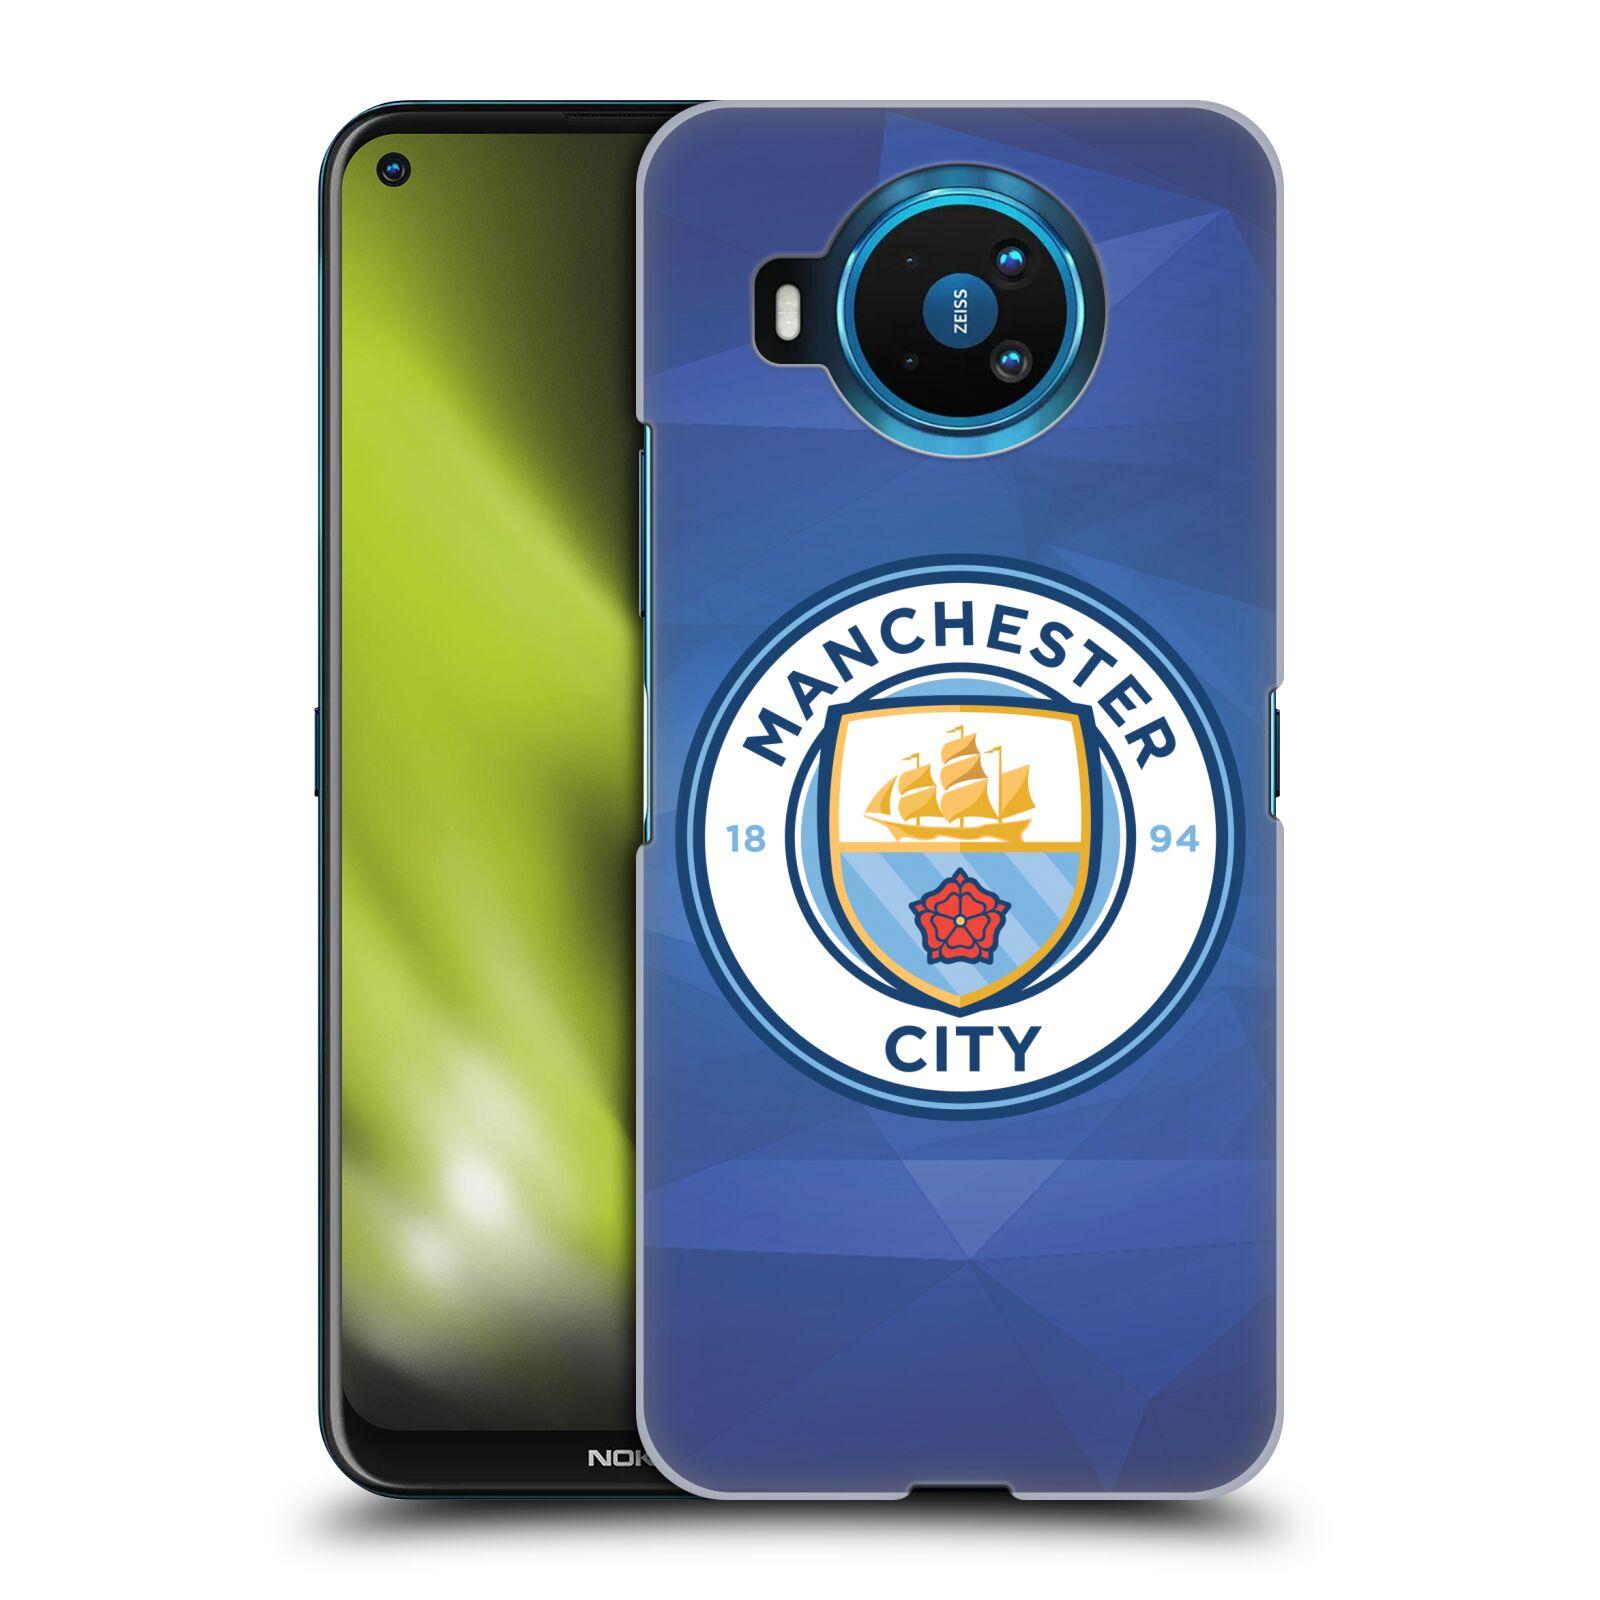 Plastové pouzdro na mobil Nokia 8.3 5G - Head Case - Manchester City FC - Modré nové logo